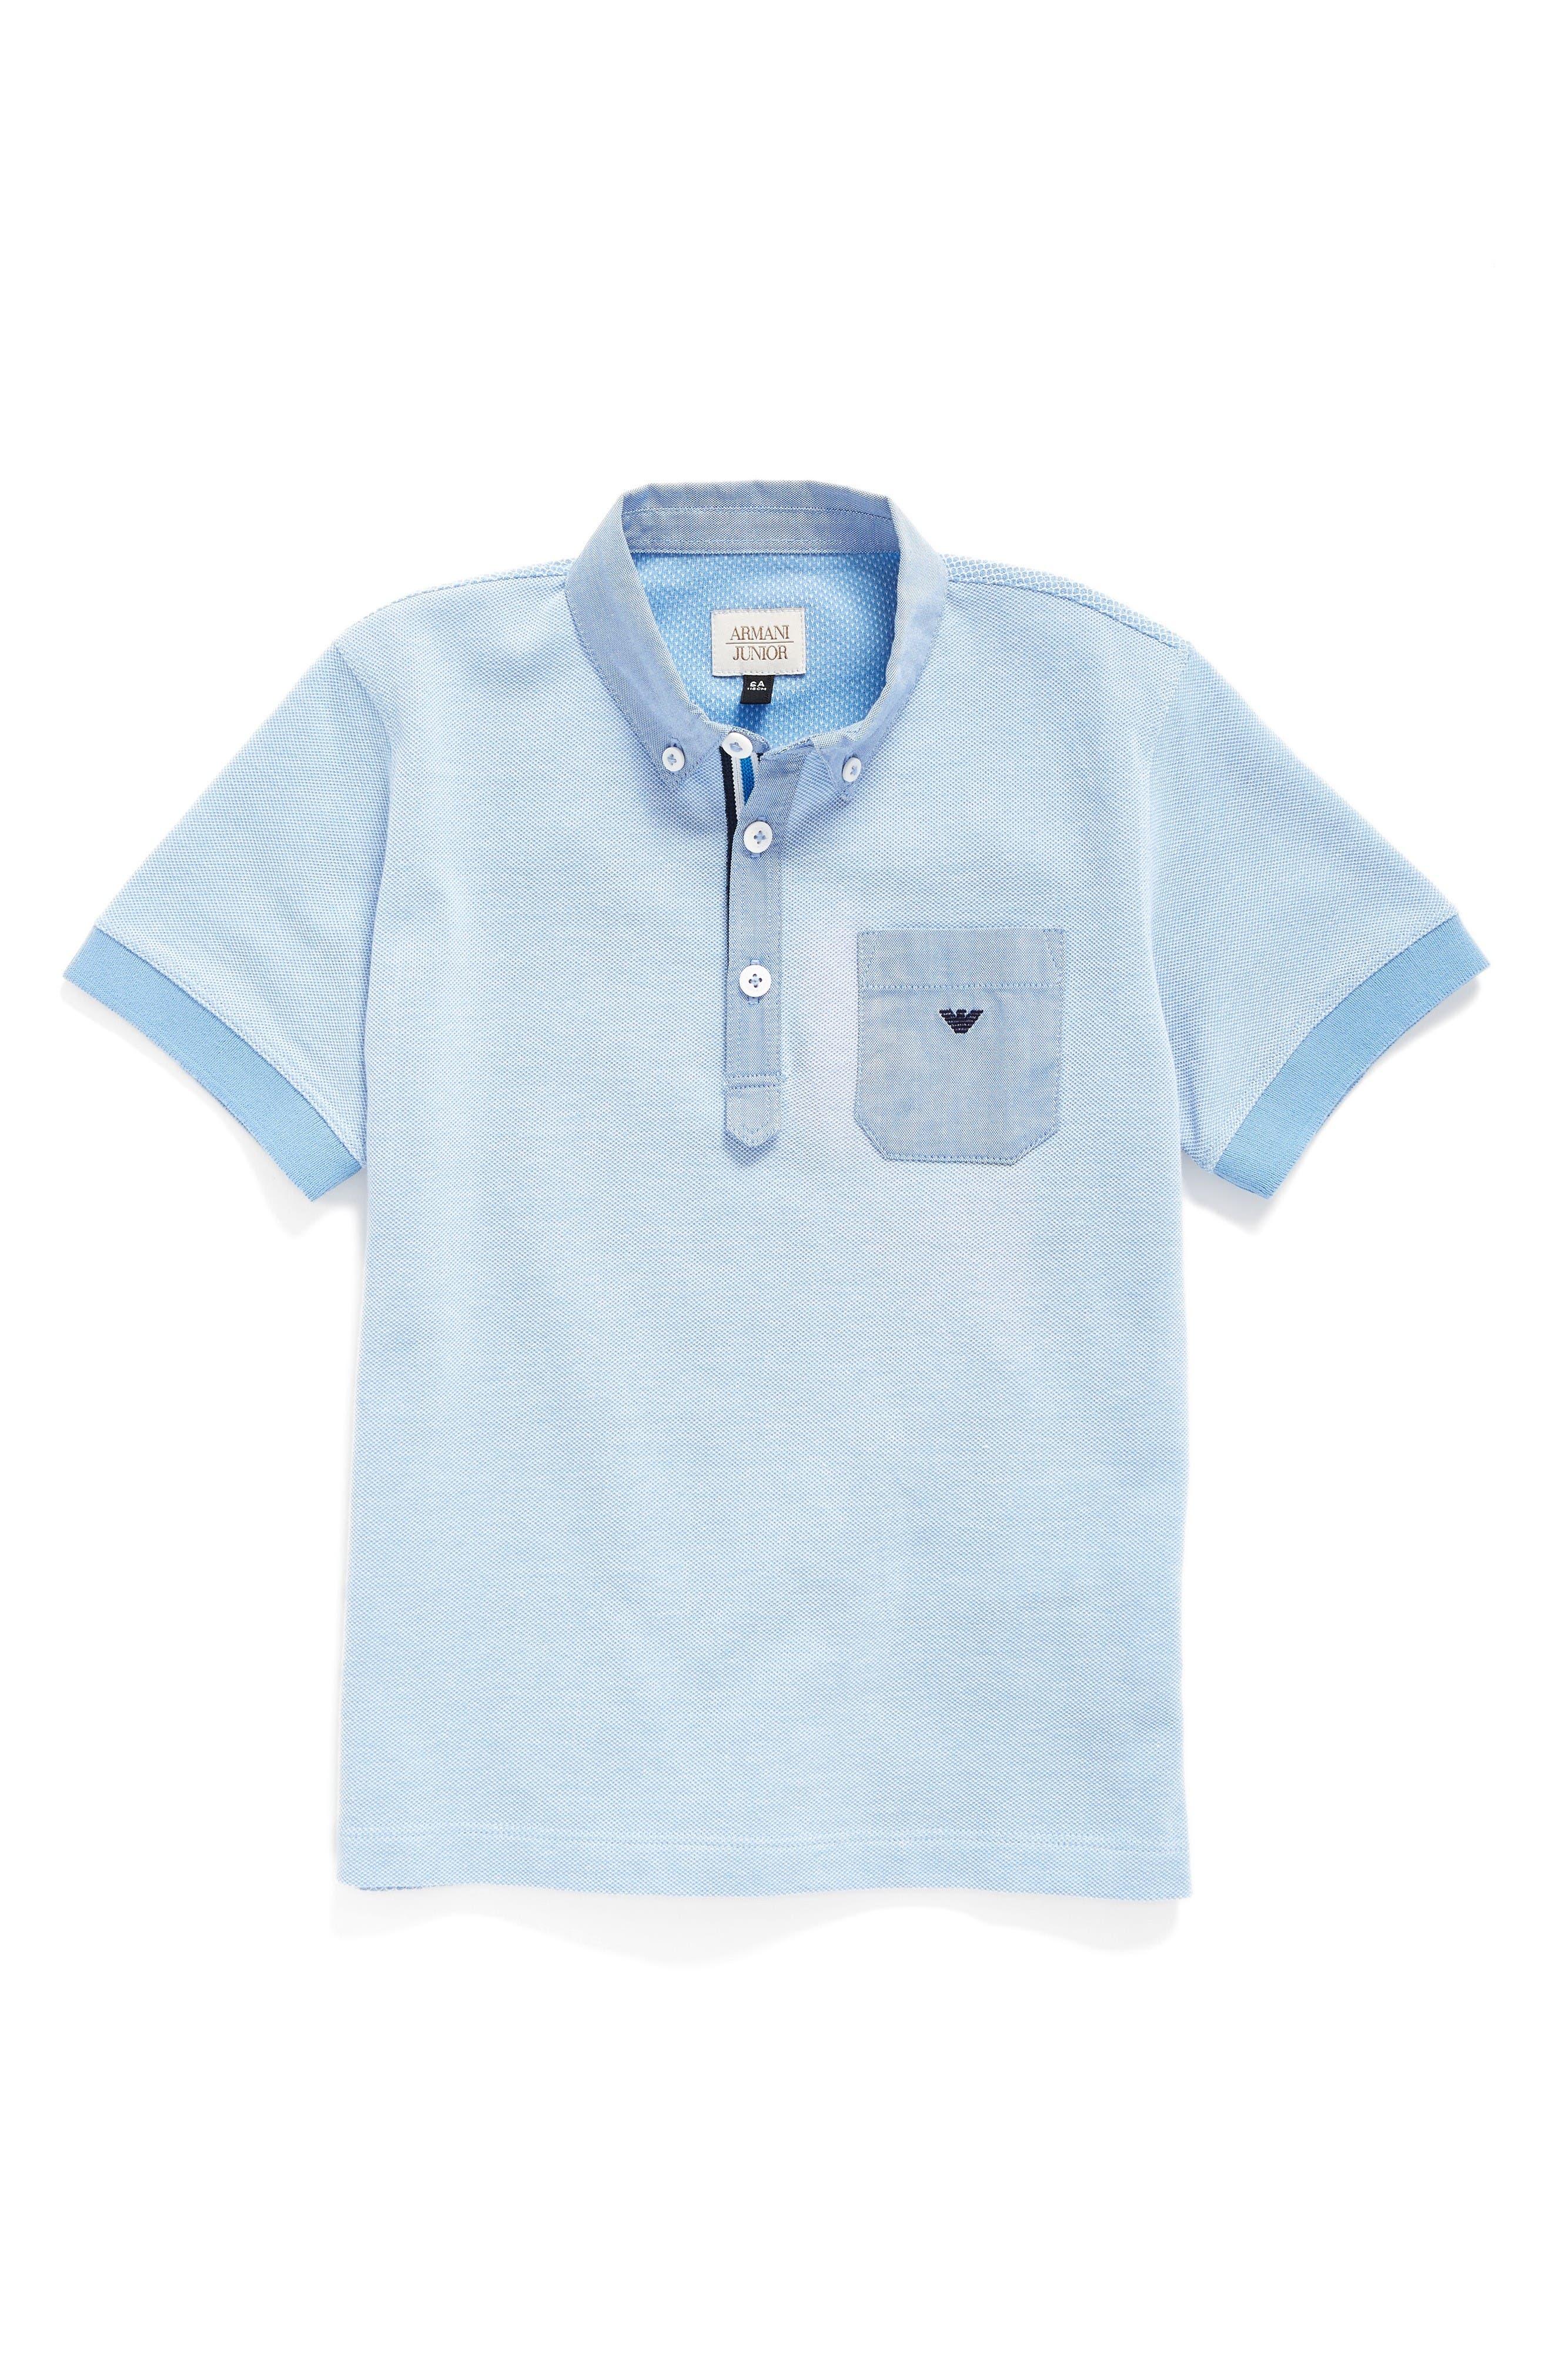 Piqué Polo,                             Main thumbnail 1, color,                             Turquoise/ Aqua